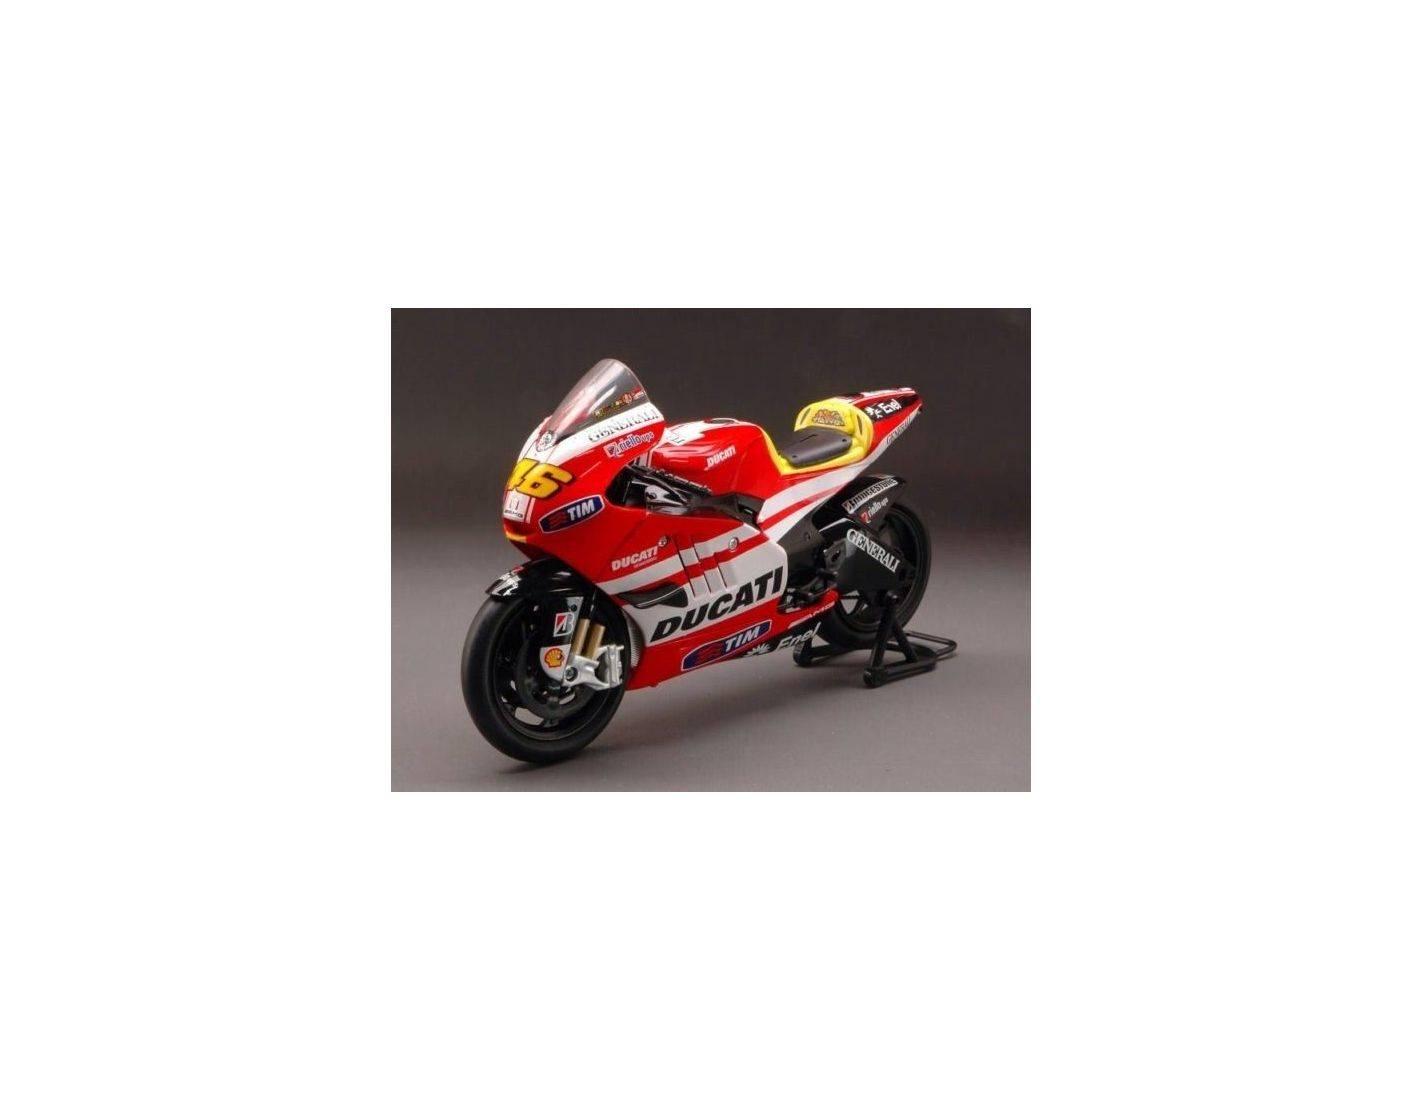 New Ray NY57063 Ducati V.Rossi 2011 1:12 MODELLINO Die Cast Model